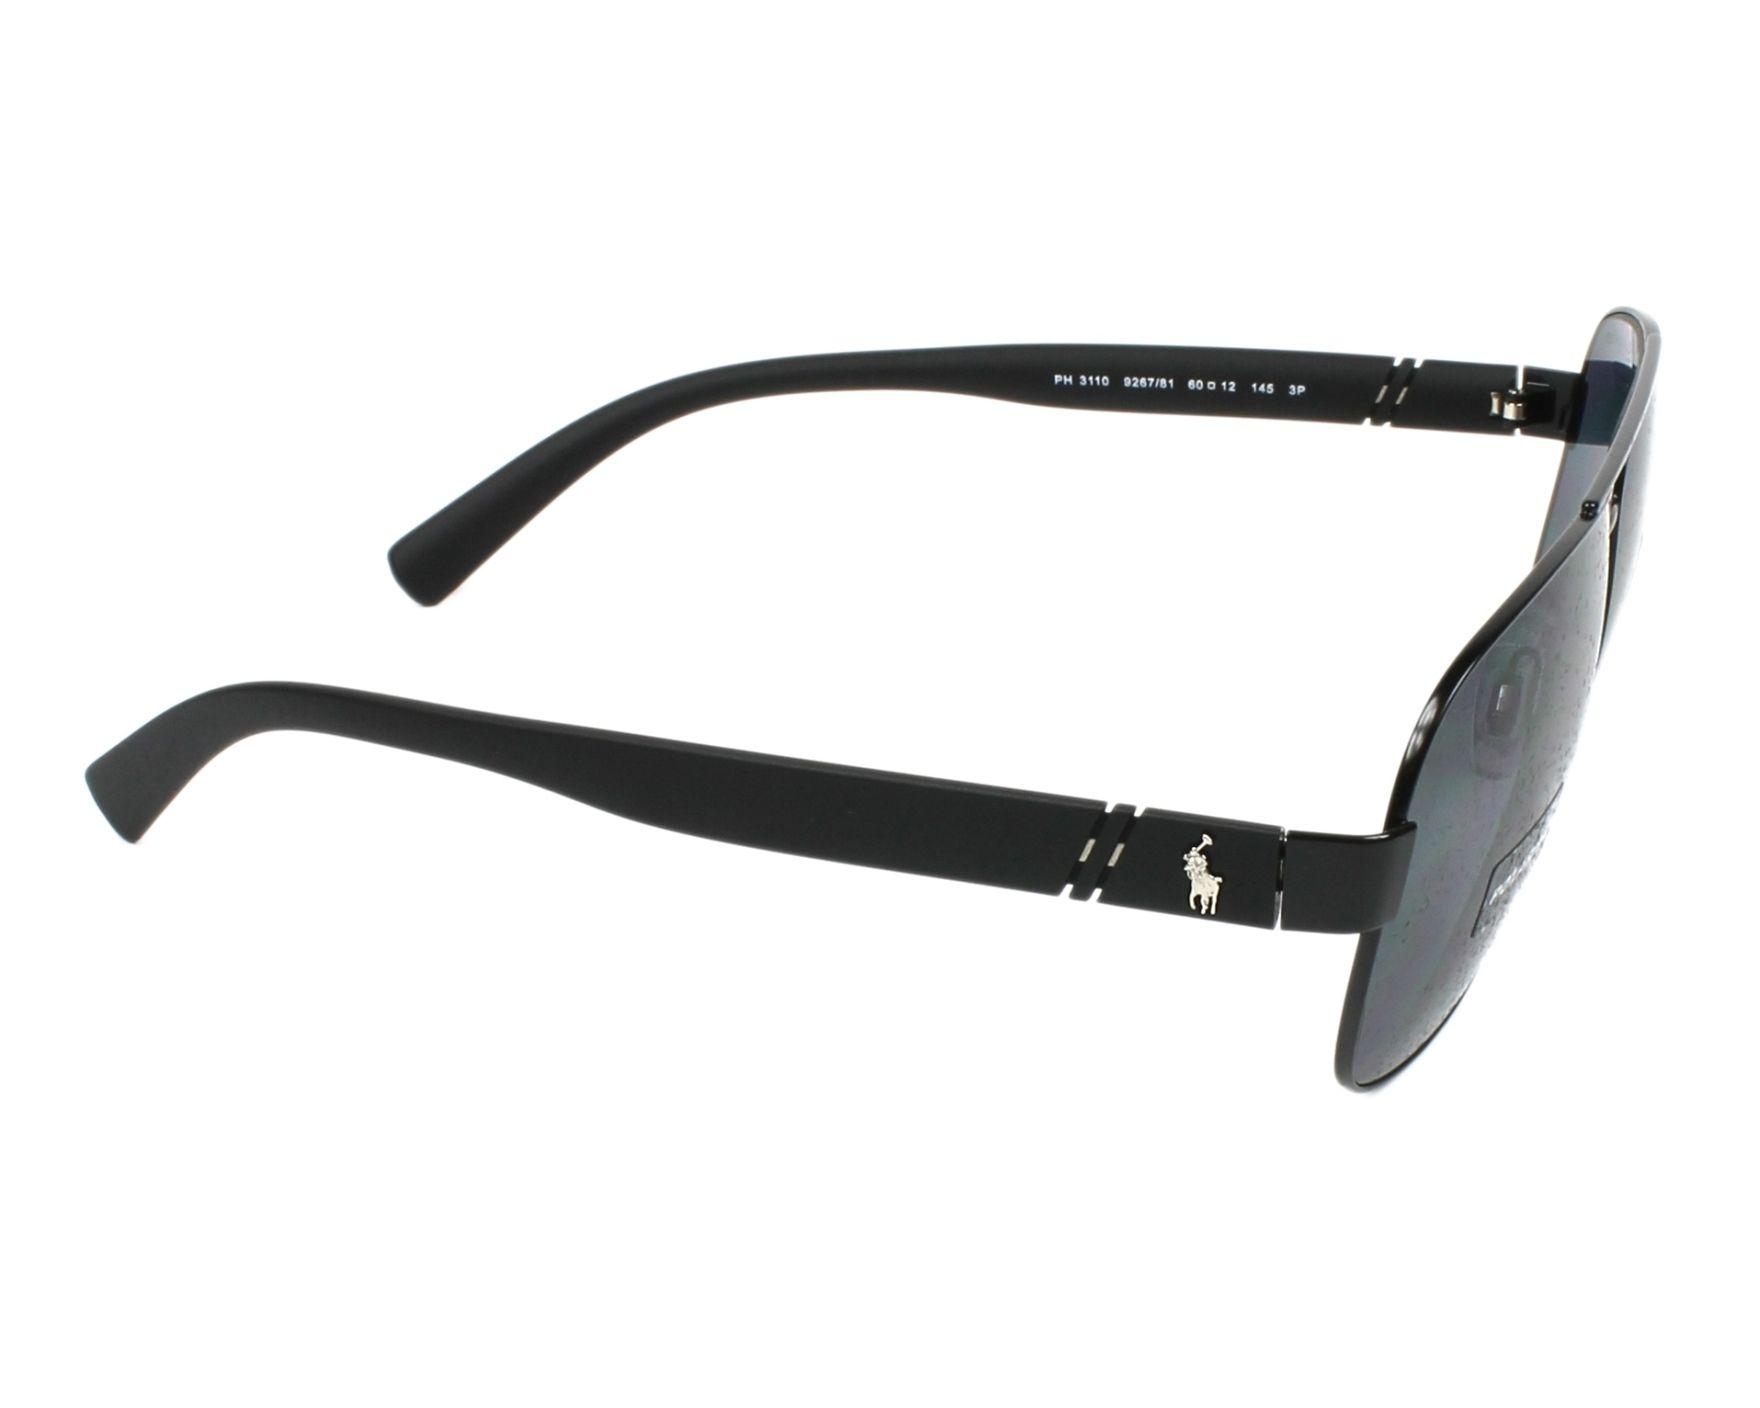 232ac3f094 Sunglasses Polo Ralph Lauren PH-3110 926781 - Black side view